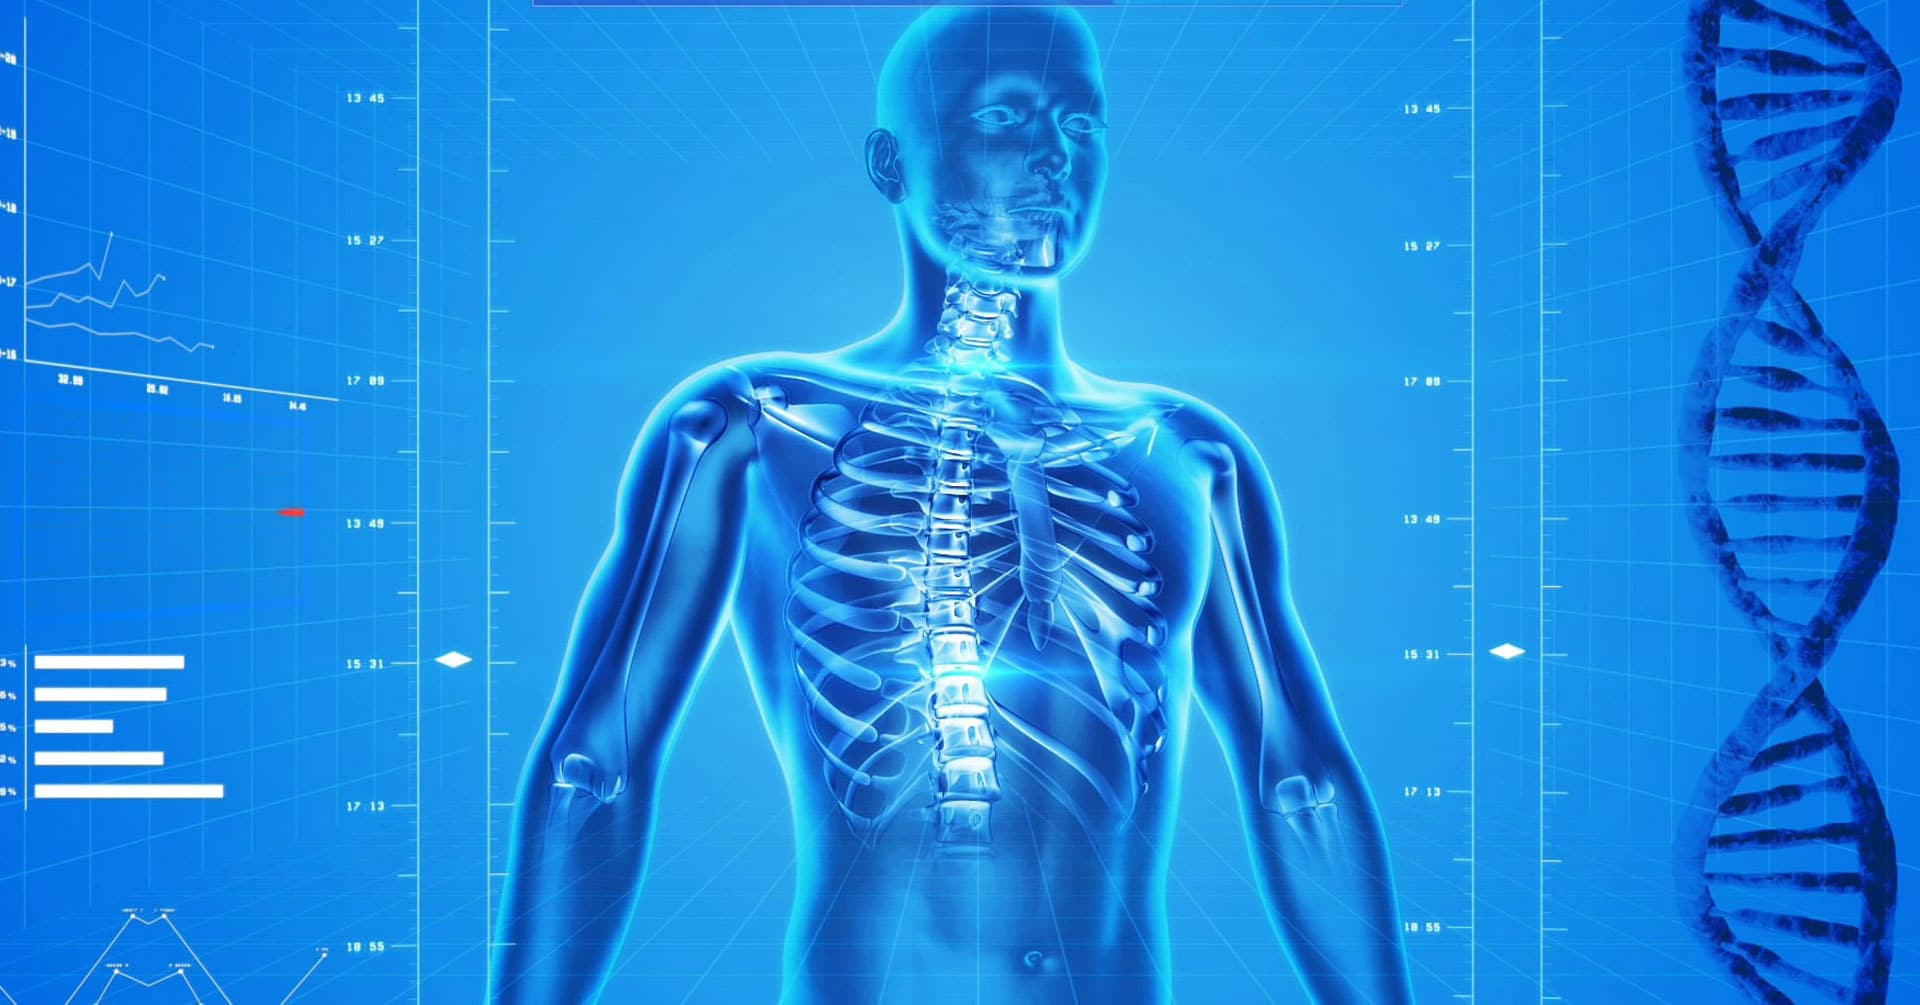 fysioterapeut utbildning